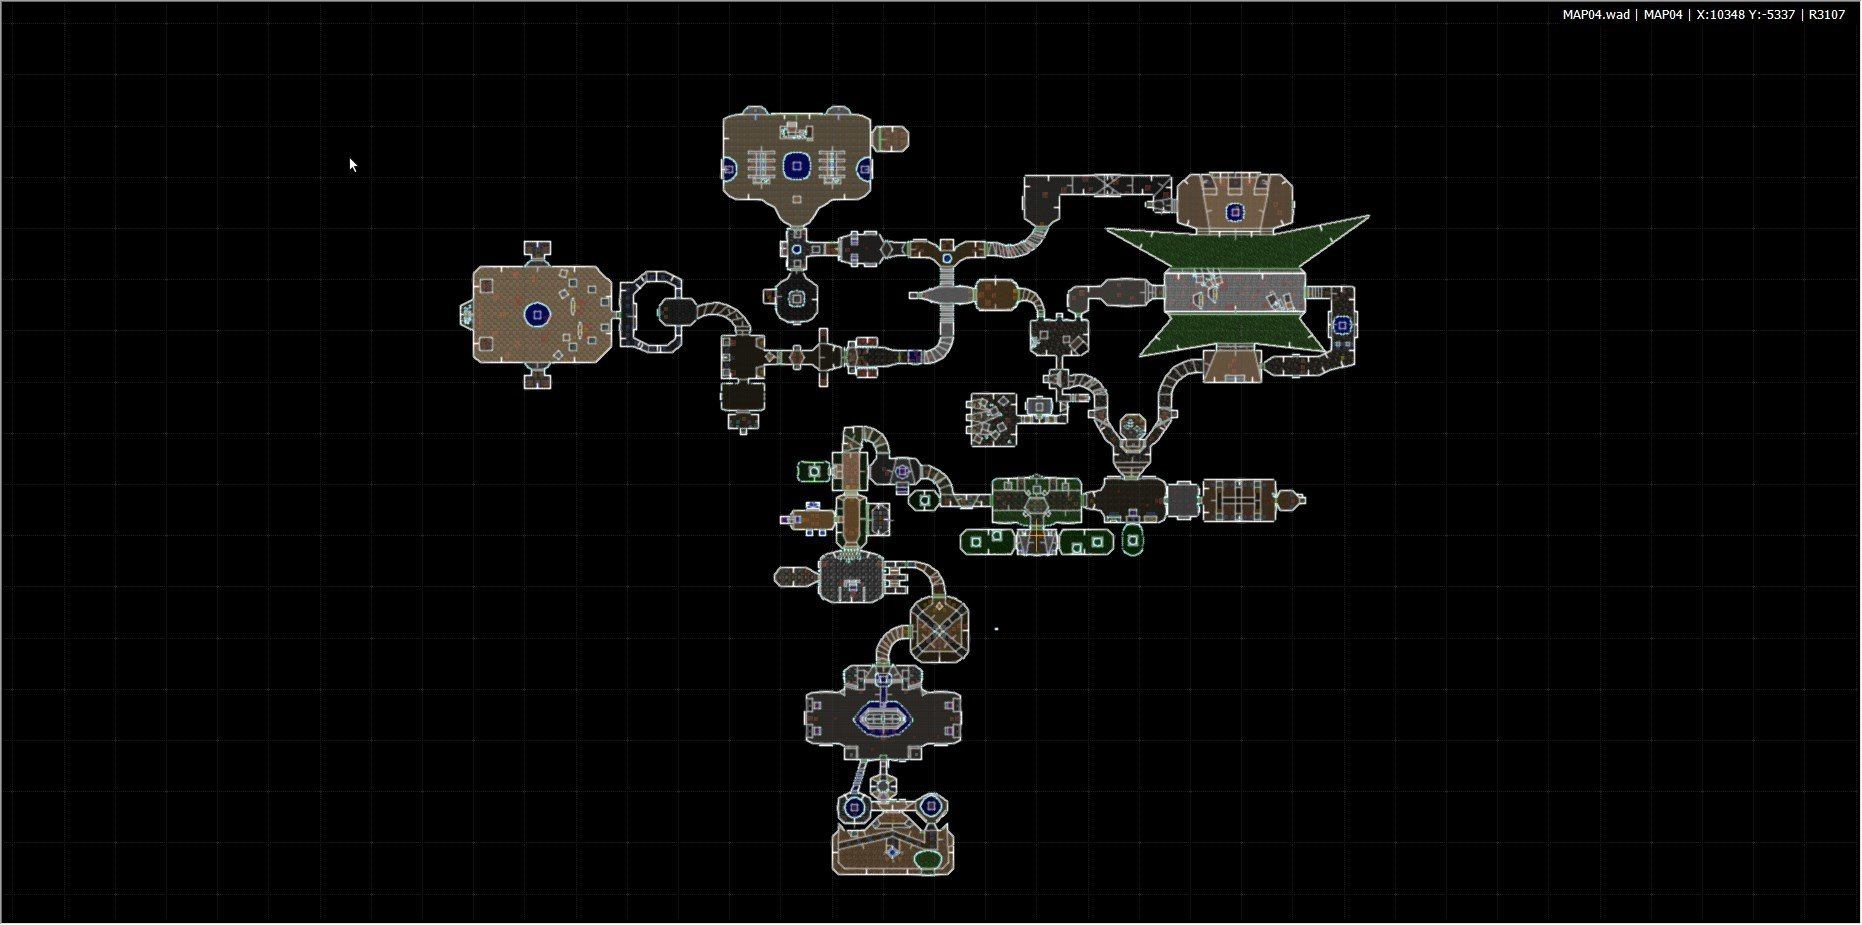 MAP04 (edit area) at 2020.11.14 20-09-37.225 [R3107].jpg